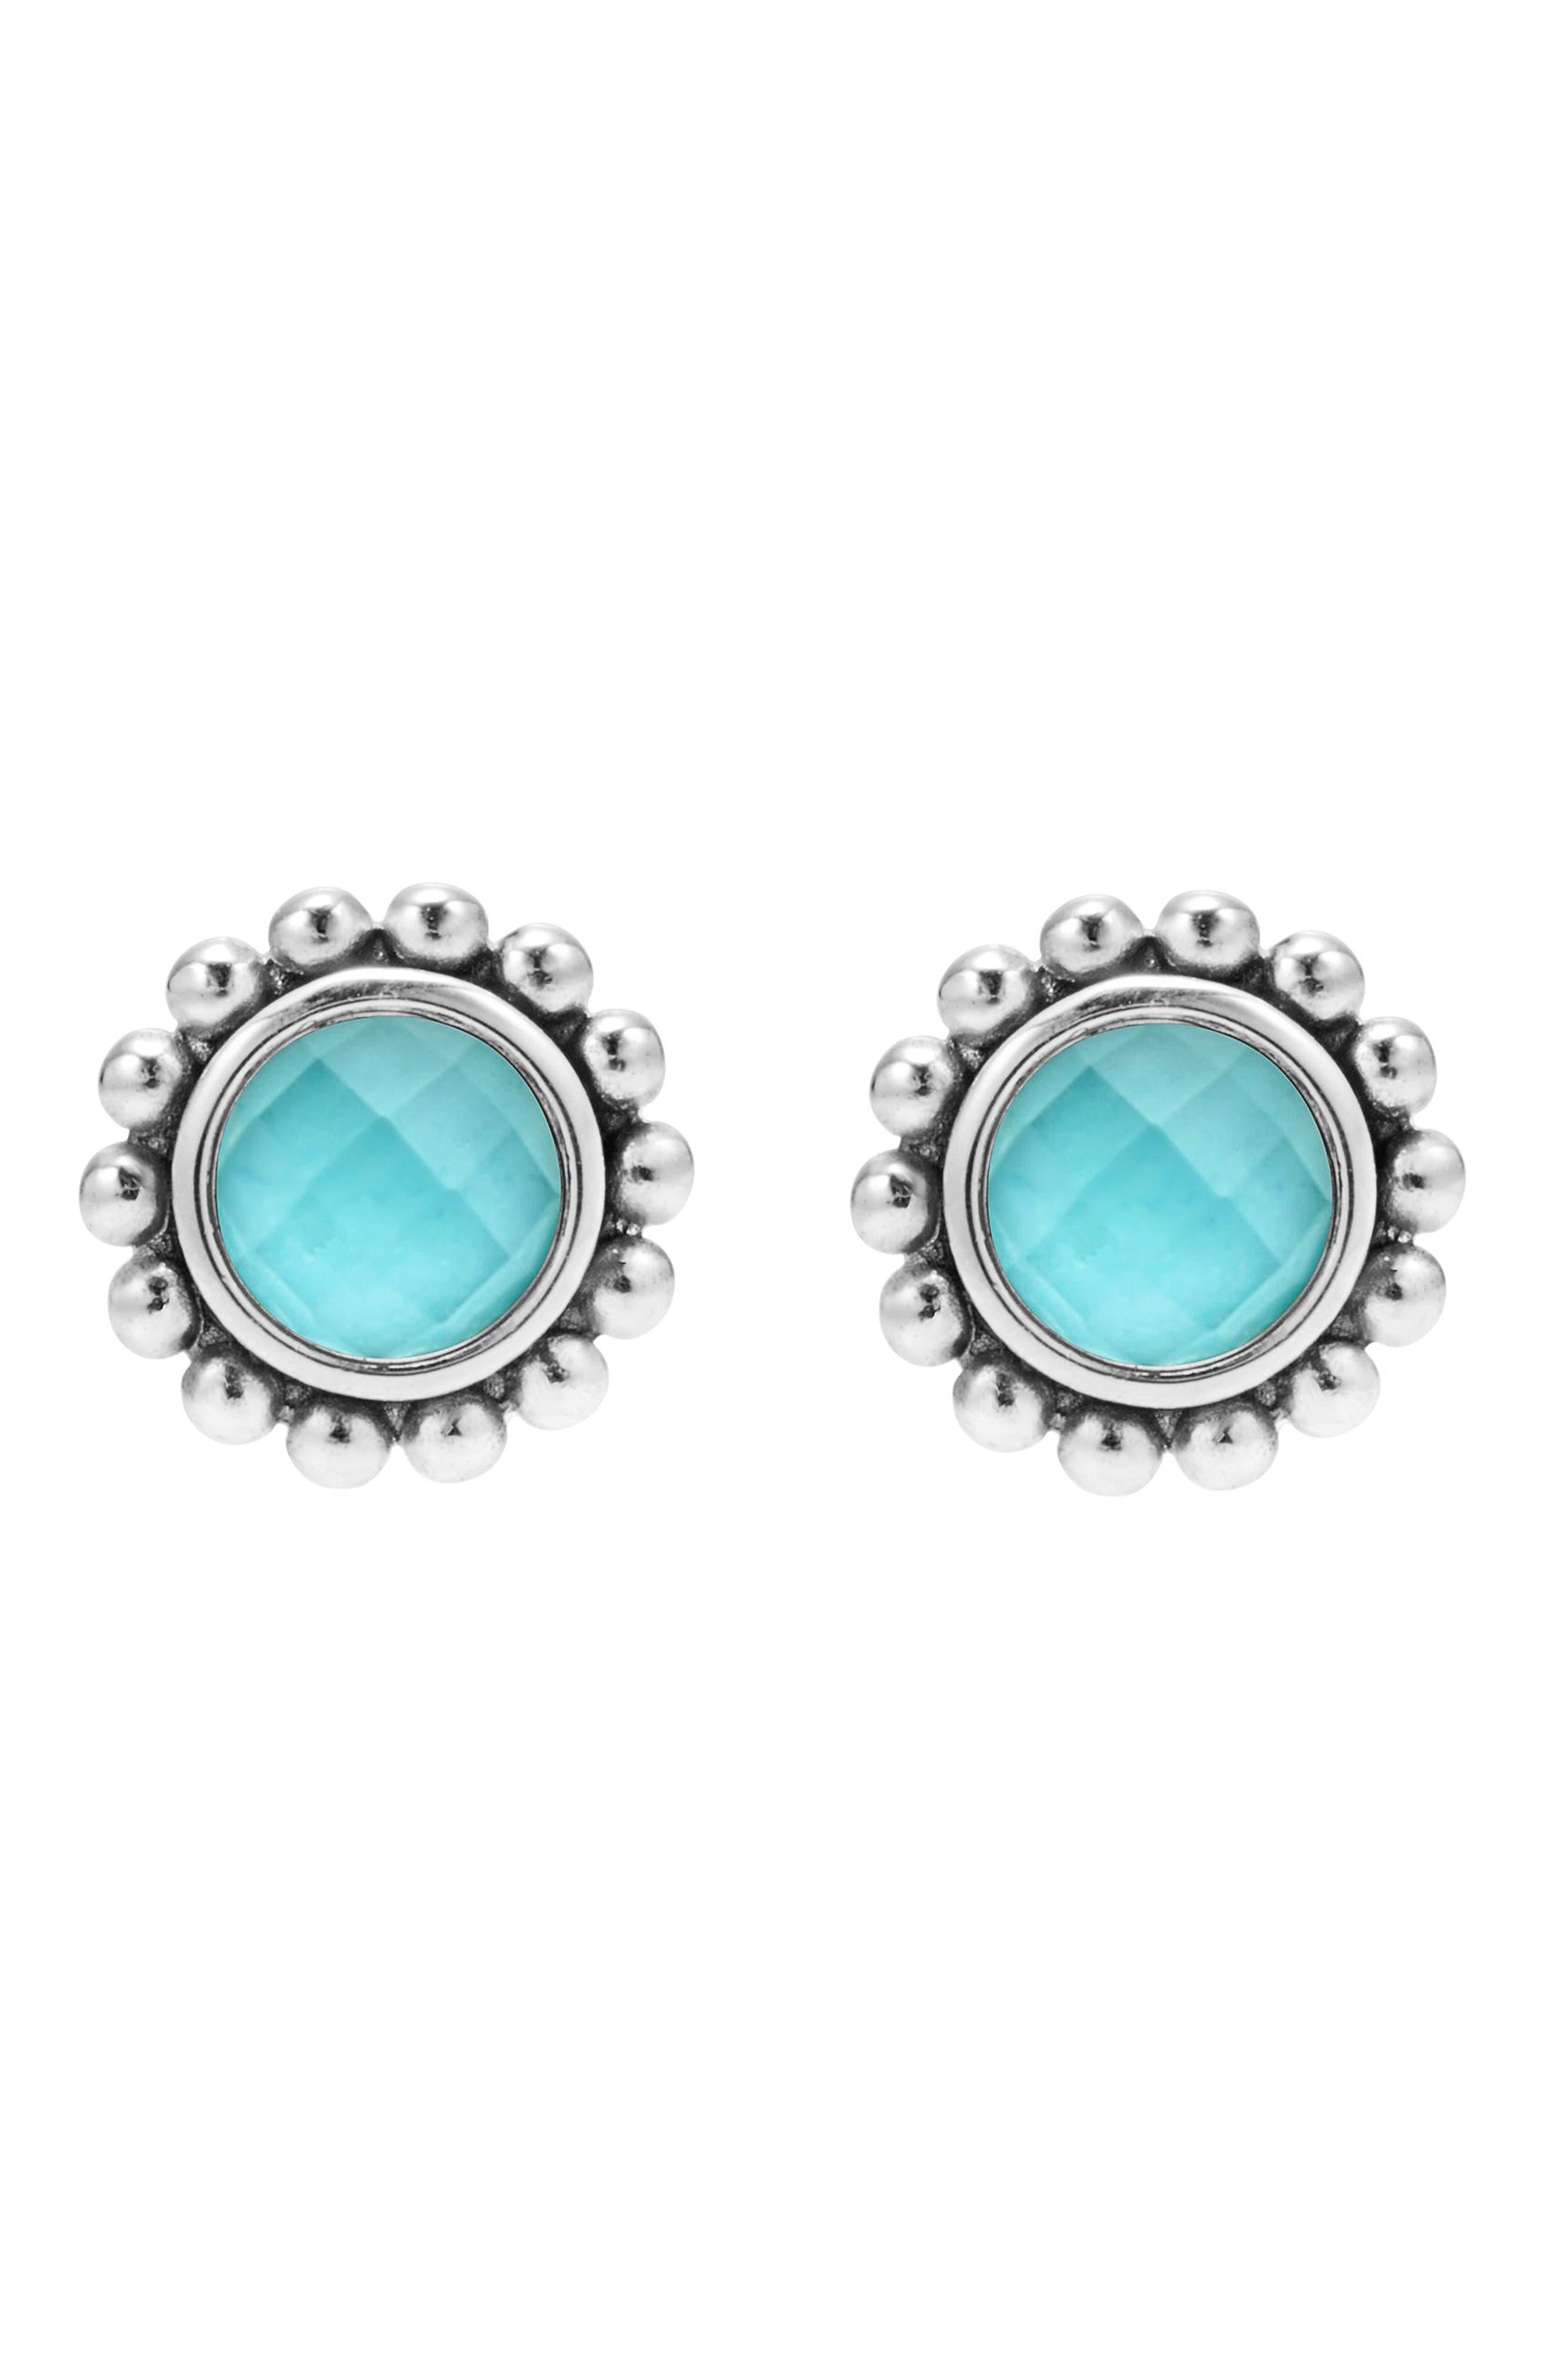 Maya Doublet Stud Earrings,                             Alternate thumbnail 3, color,                             TURQUOISE